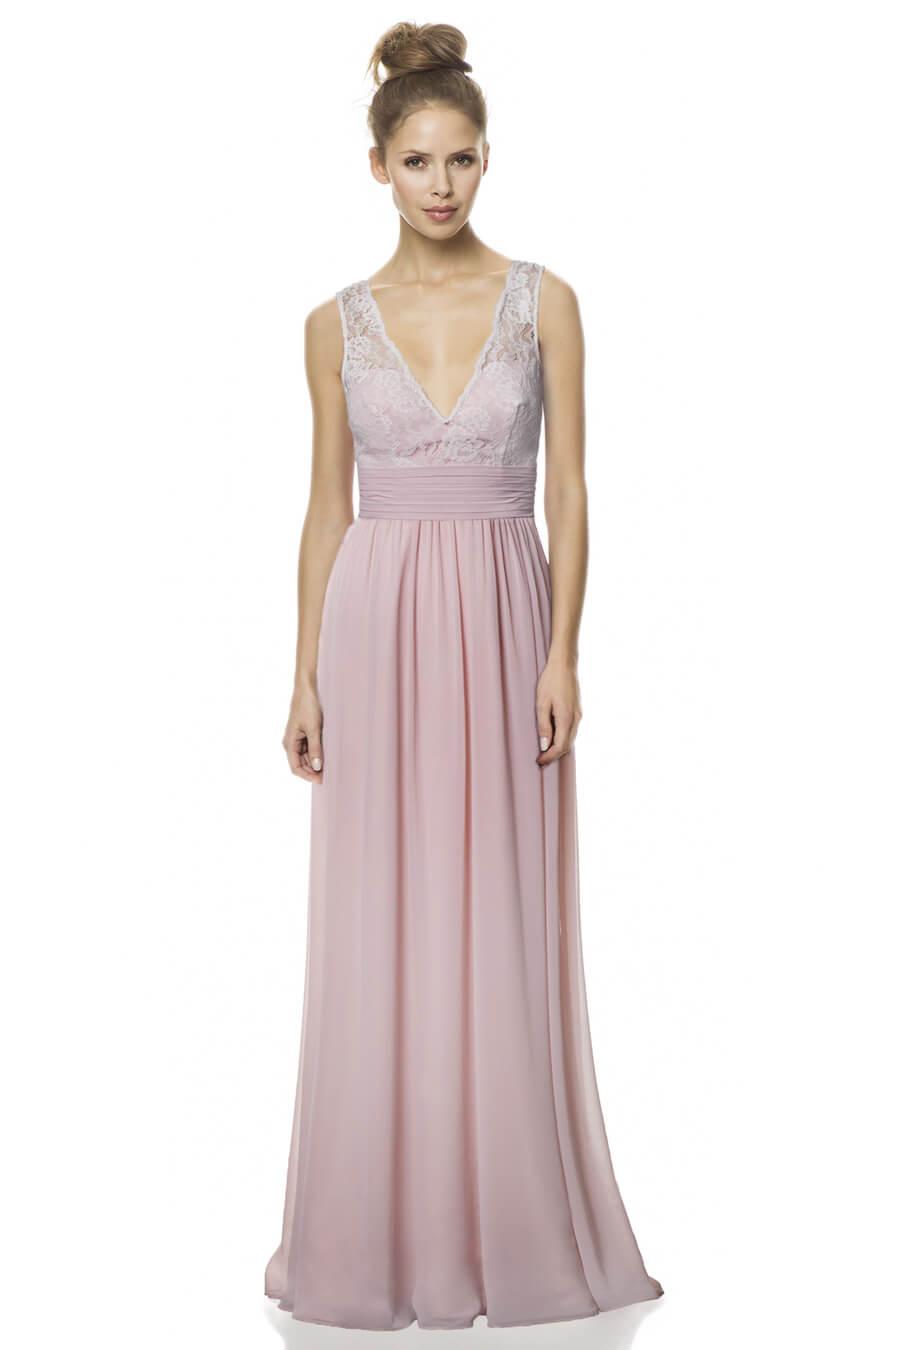 Wisteria Bridesmaid Dresses